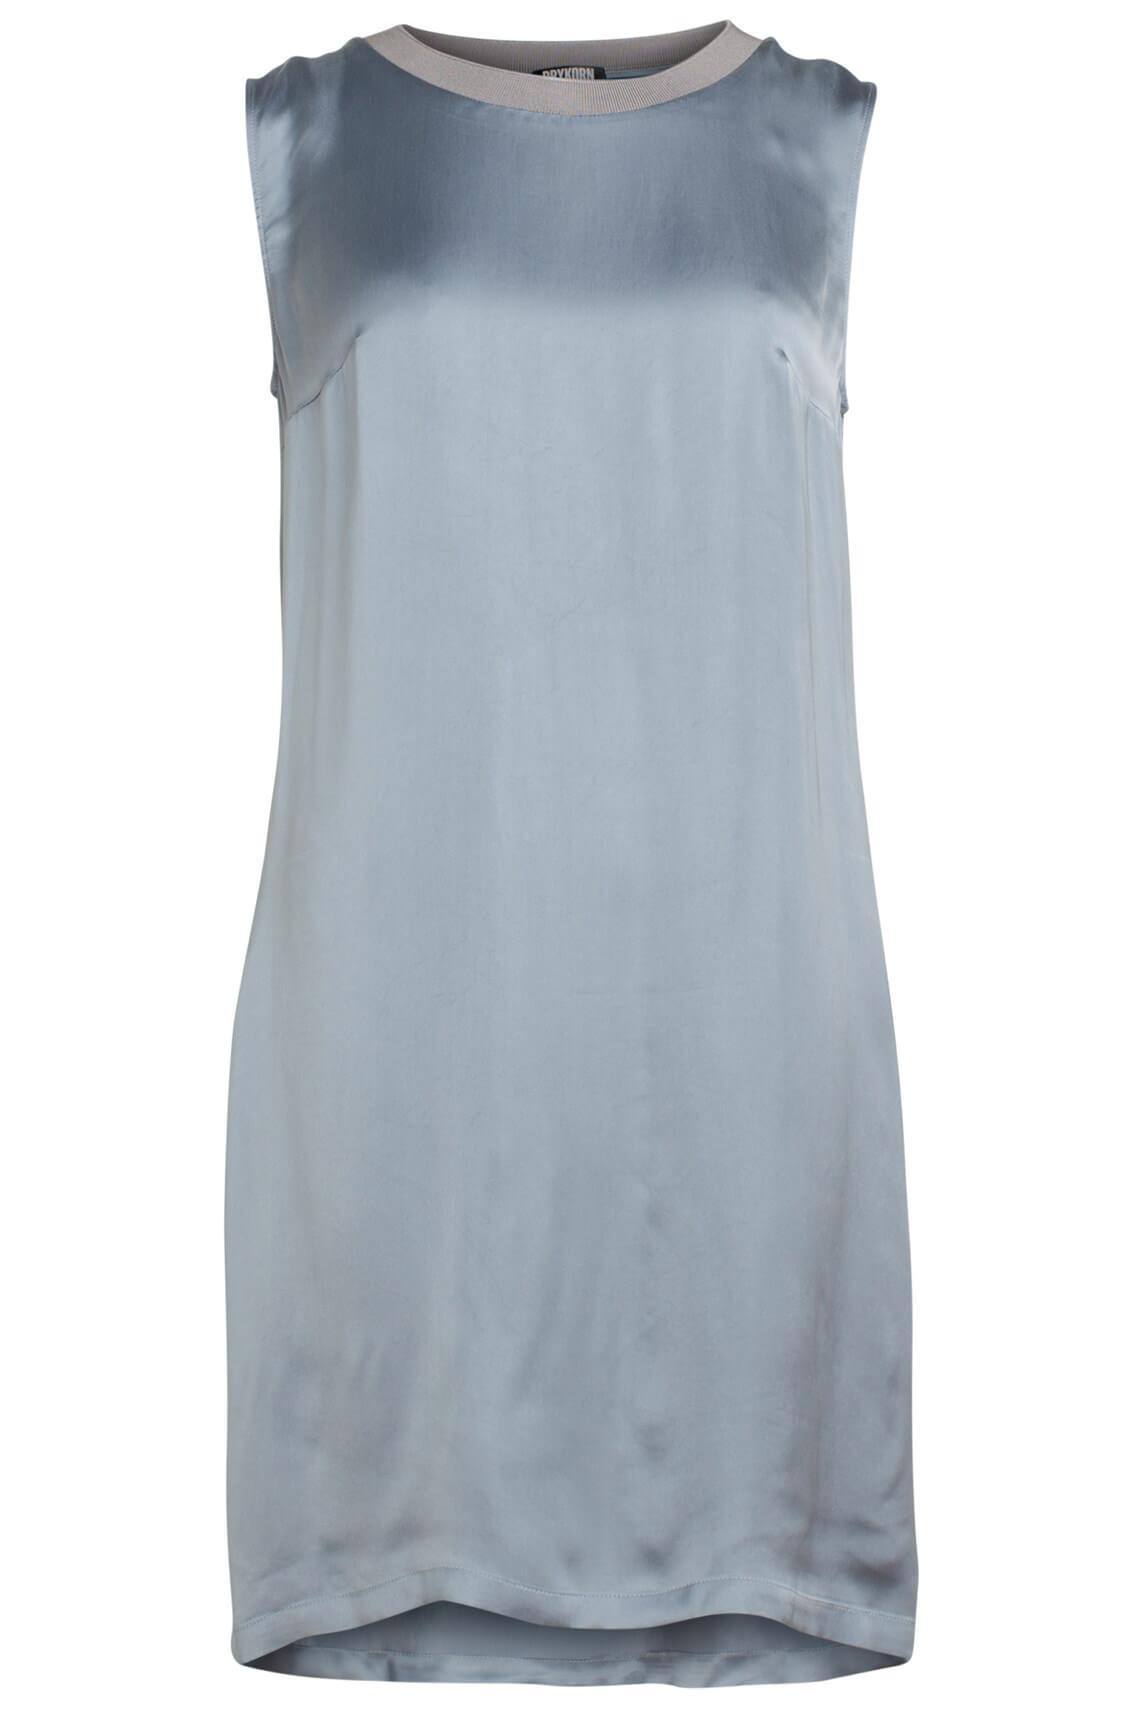 Drykorn Dames Sanaa jurk Grijs